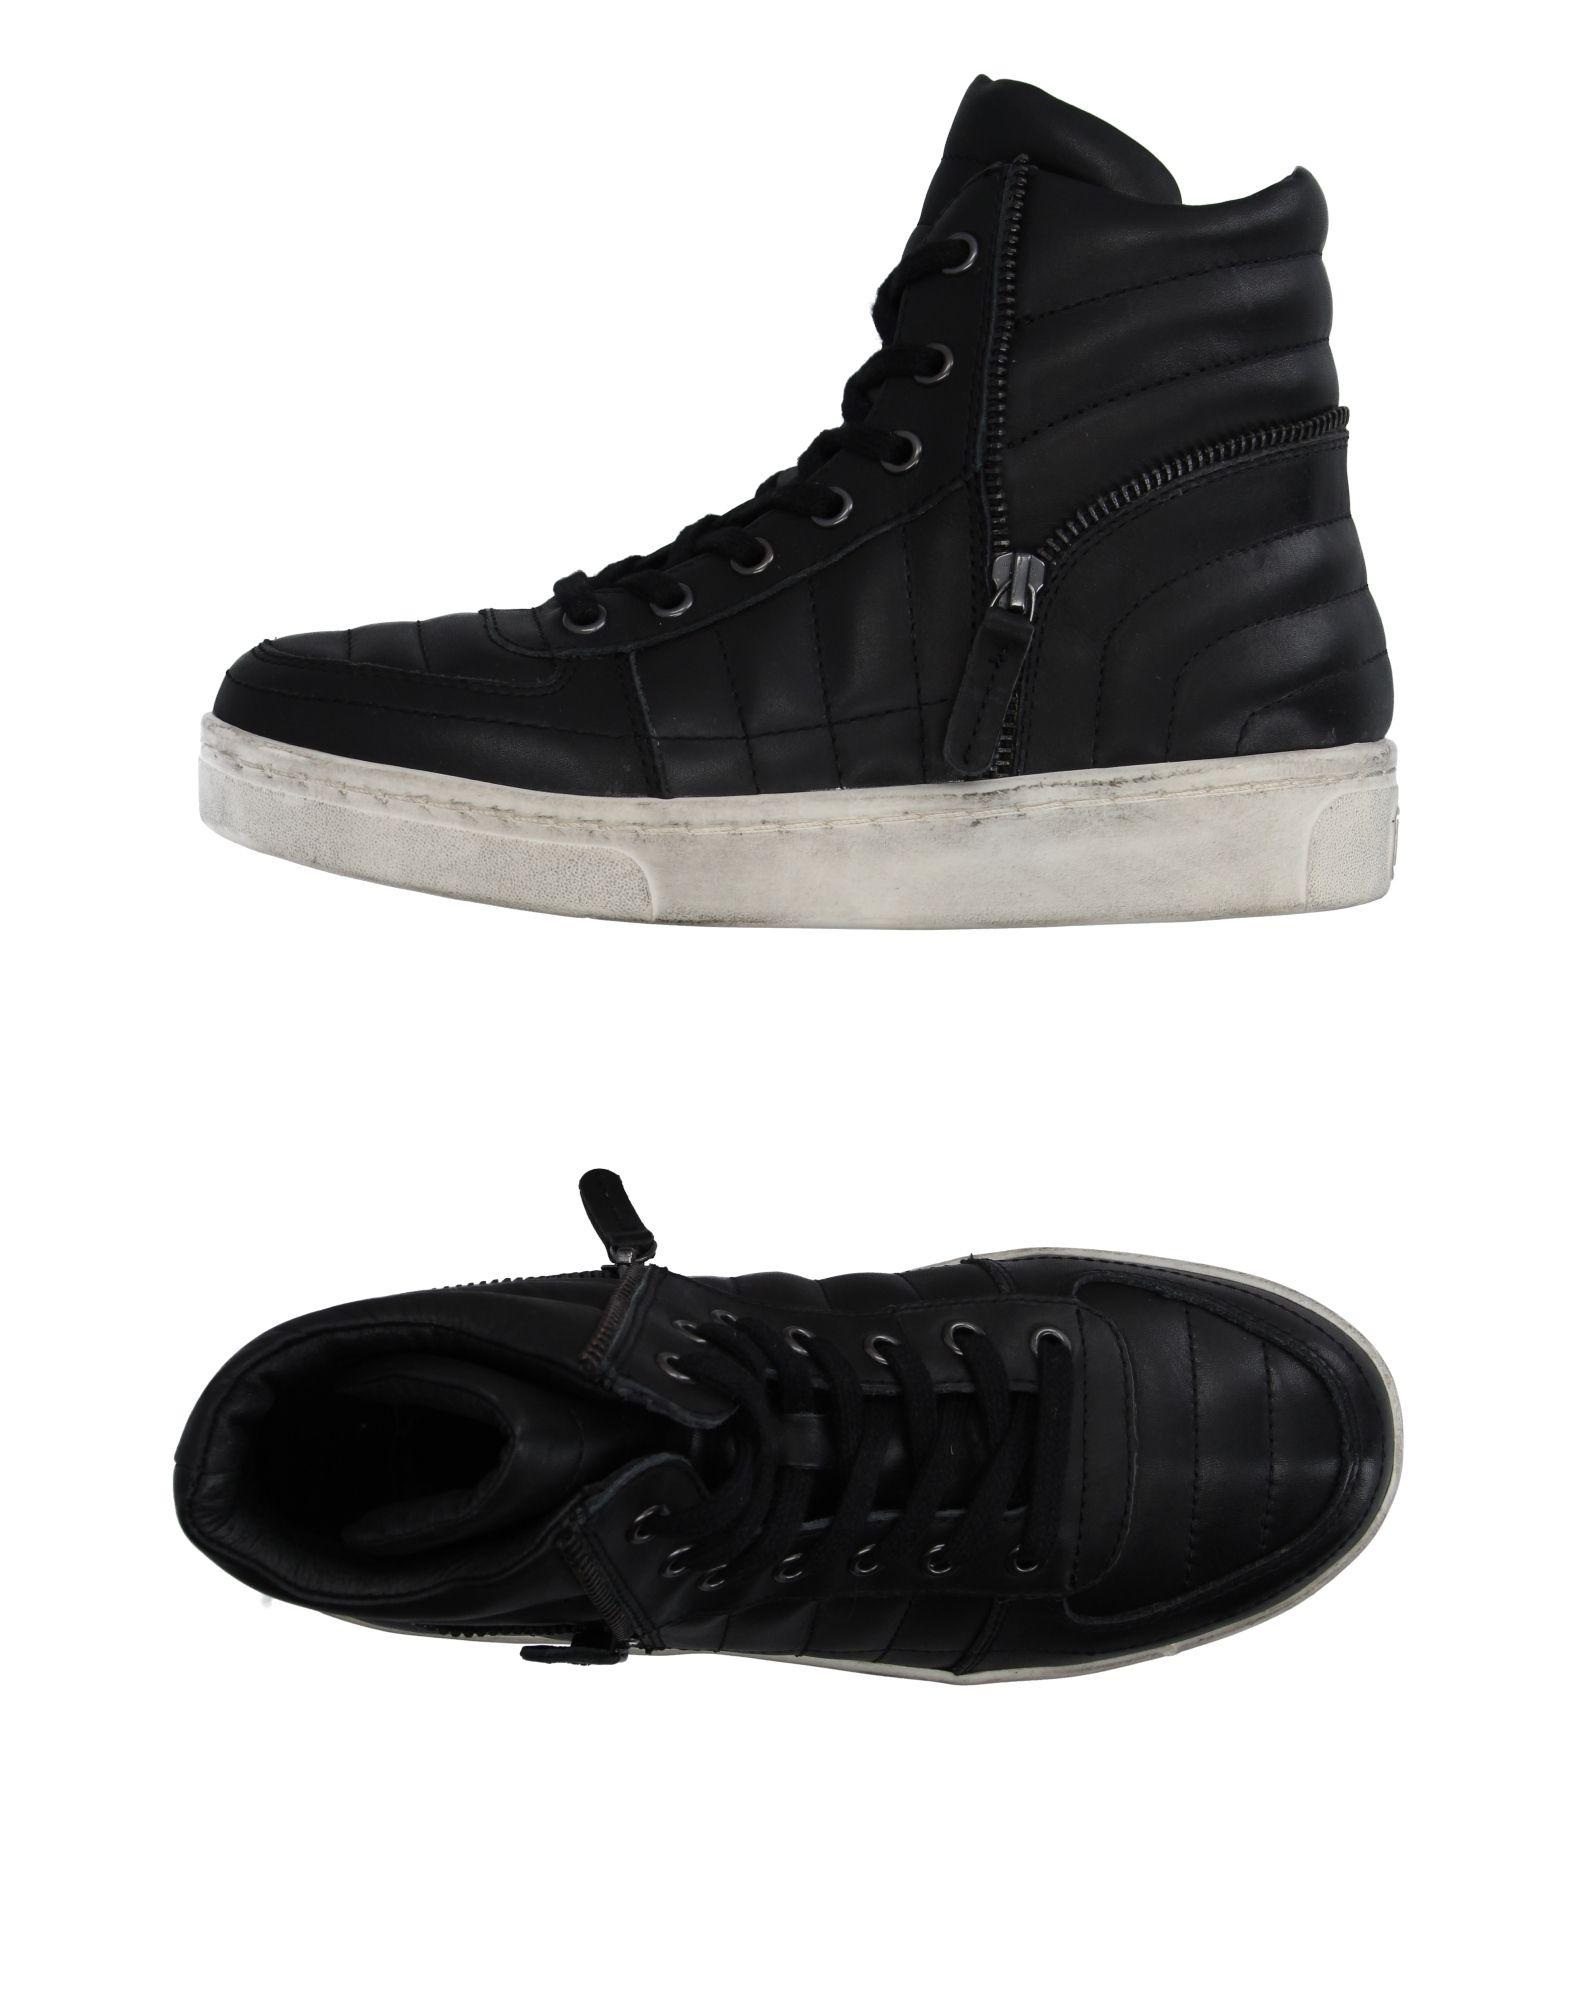 Moda Sneakers Ash Donna - 11144030AJ